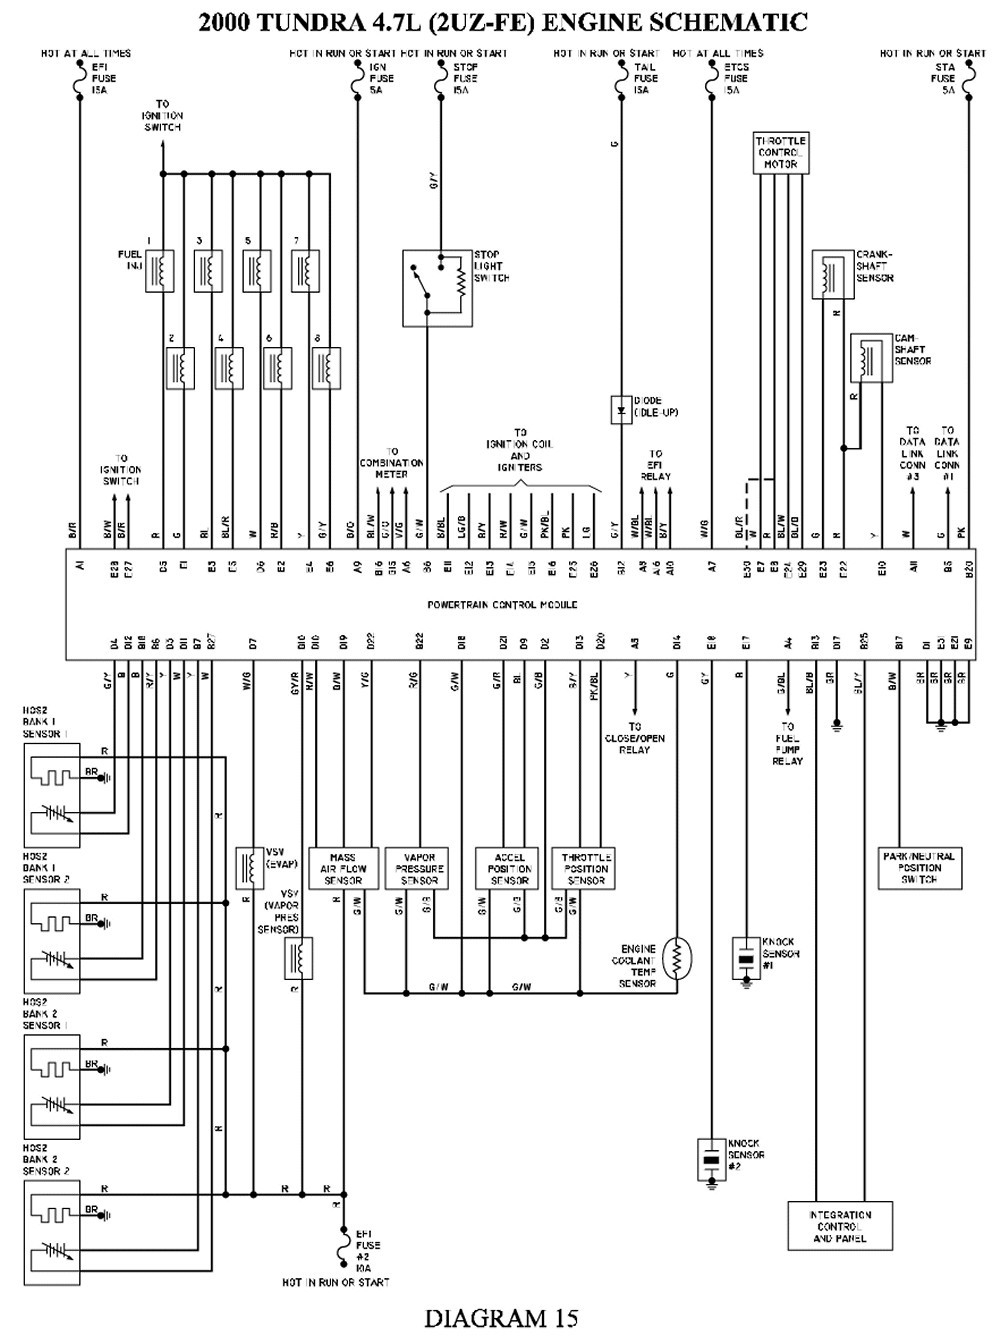 2000 toyota tundra radio wiring auto electrical wiring diagram rh goedgeregeldgroepzaandam nl